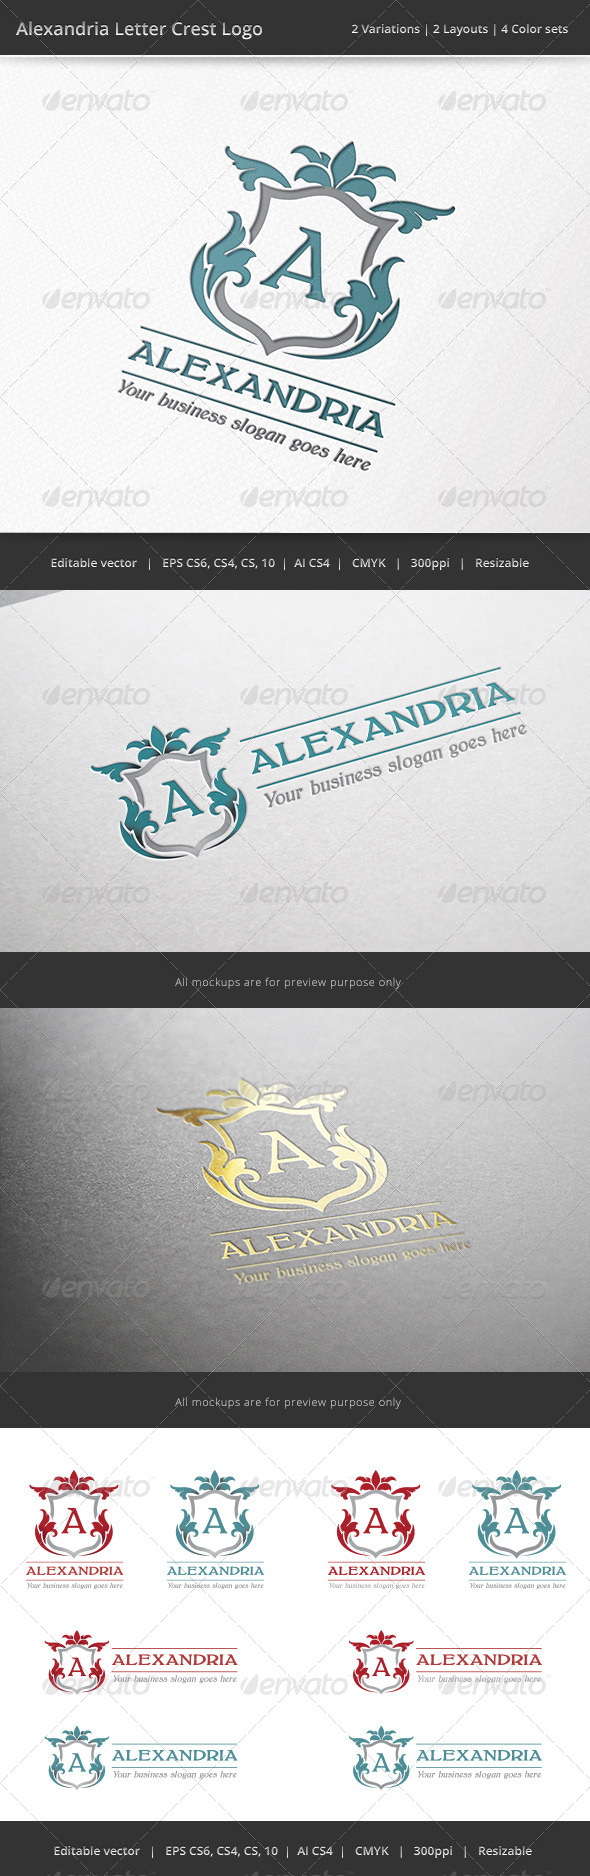 GraphicRiver Alexandria Letter Crest Logo 7087080